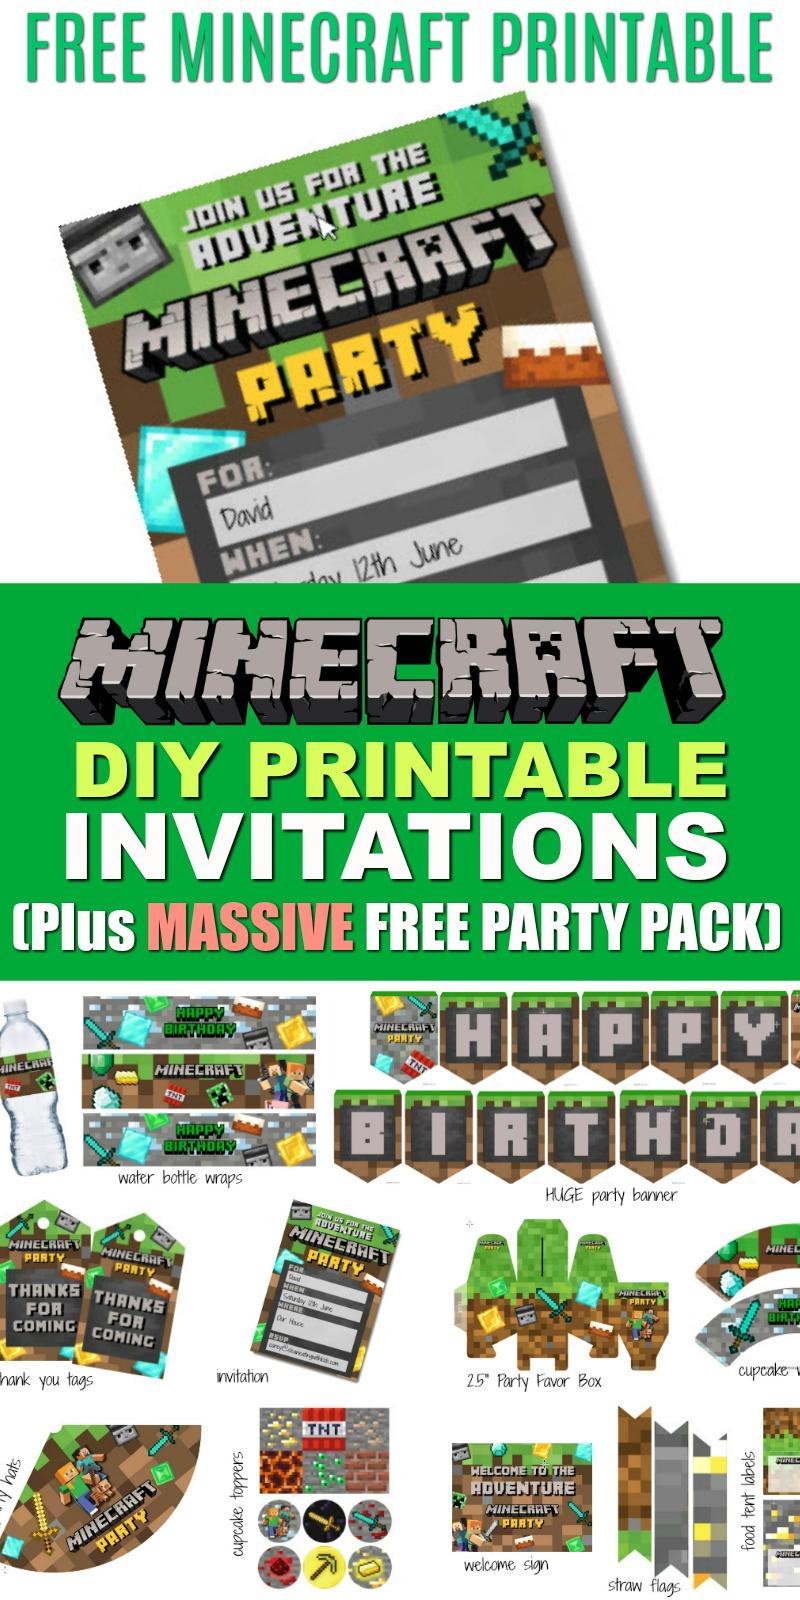 Free Diy Printable Minecraft Birthday Invitation - Clean Eating With - Free Printable Minecraft Invitations